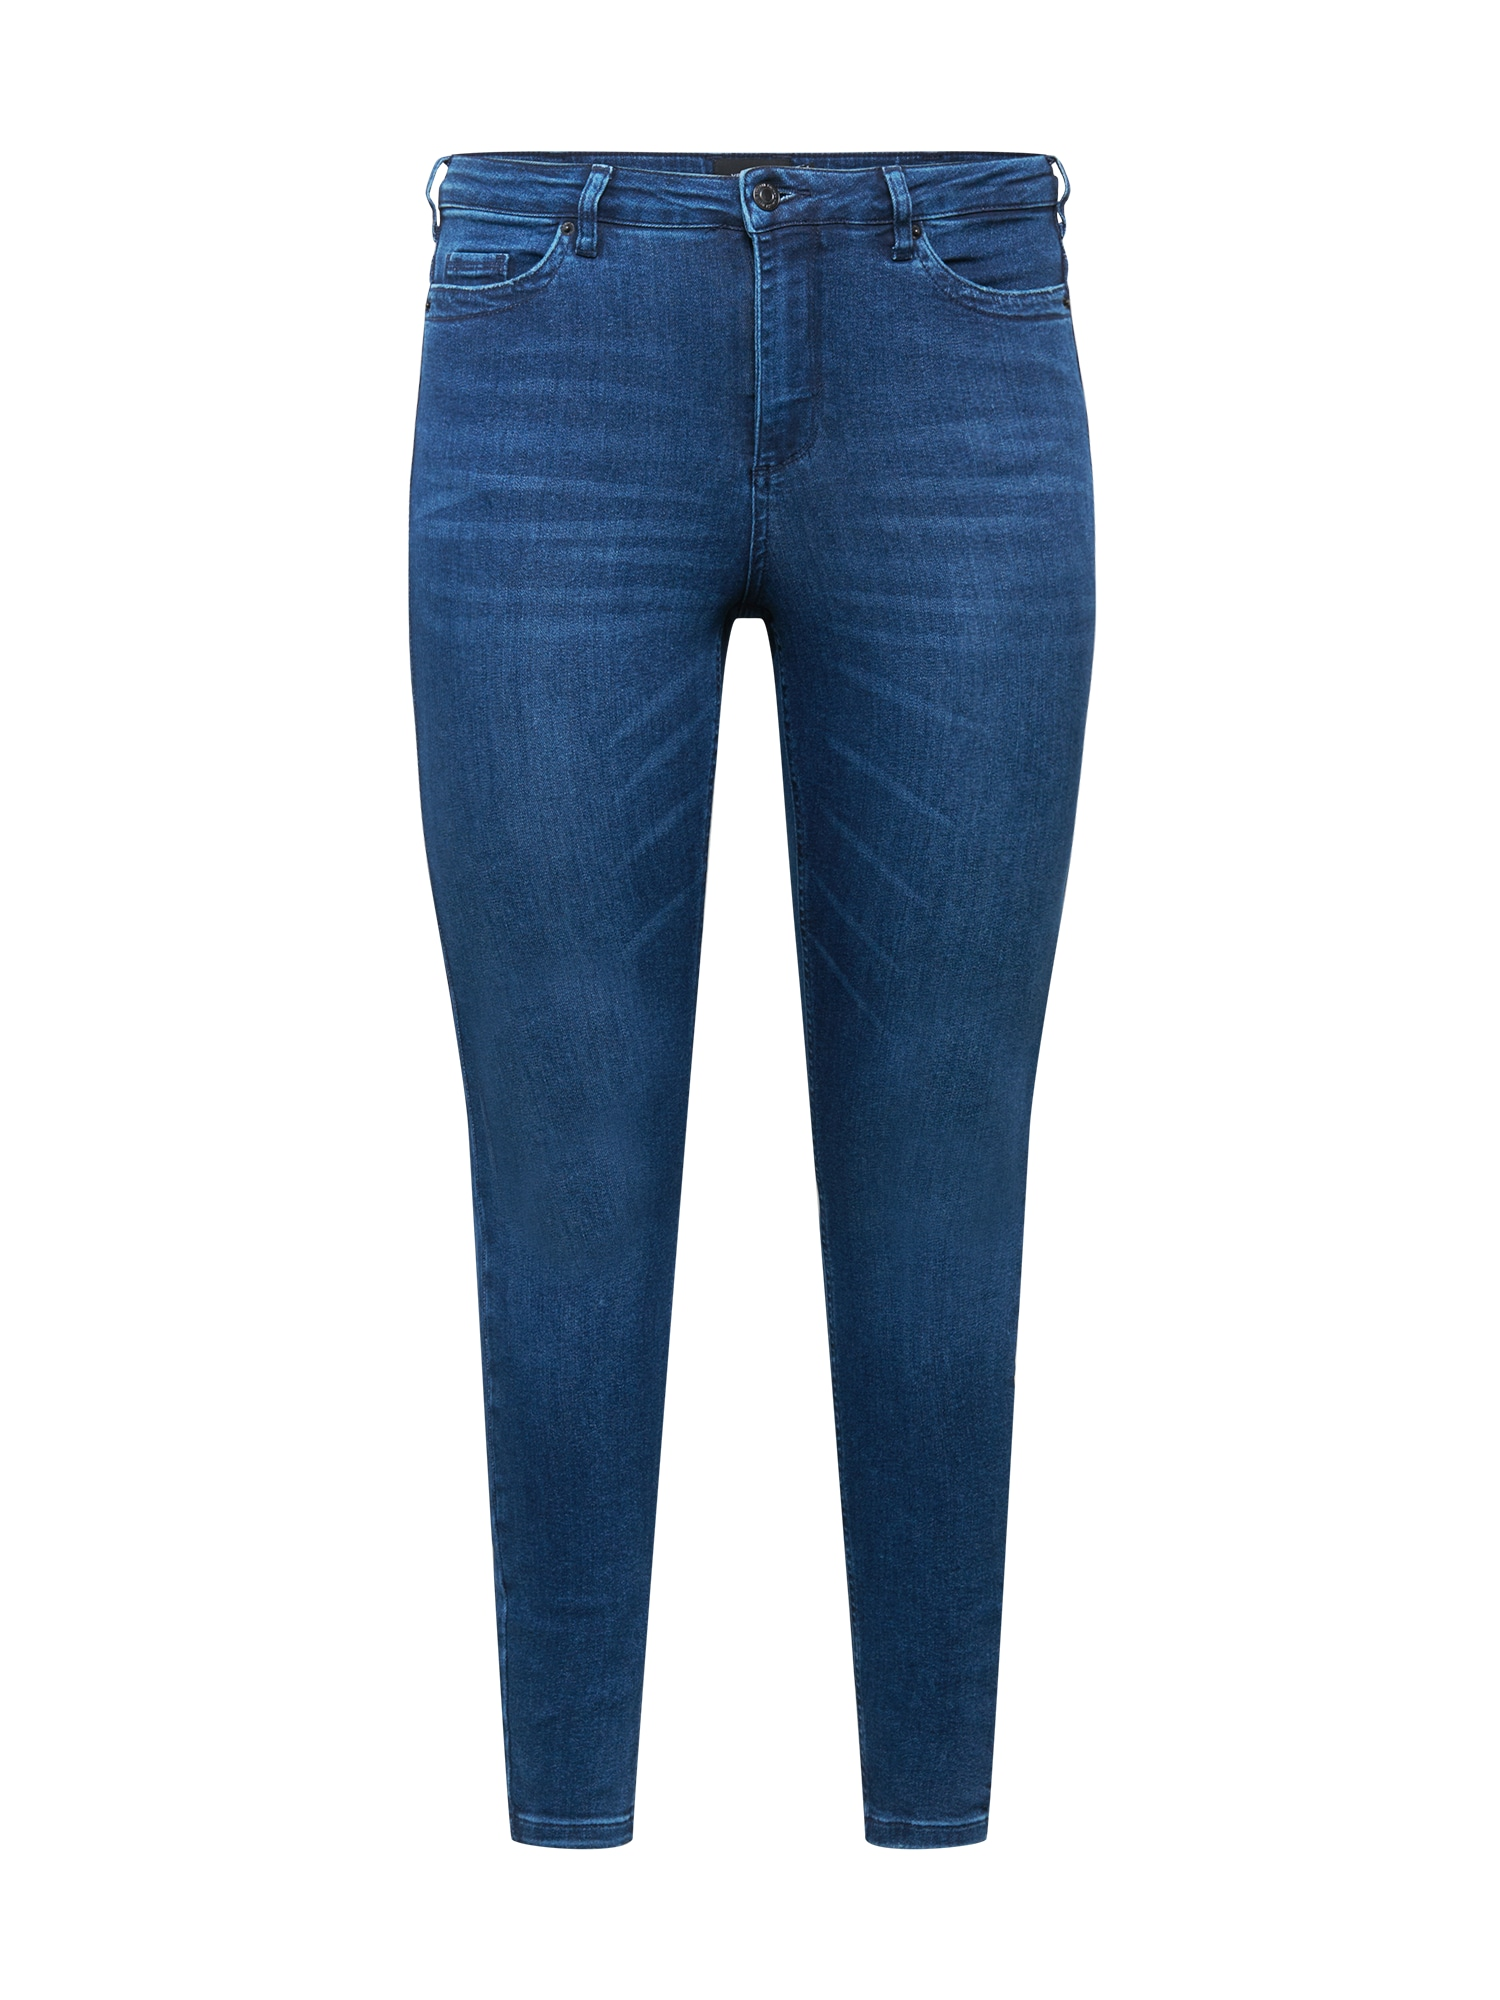 Vero Moda Curve Džinsai tamsiai (džinso) mėlyna